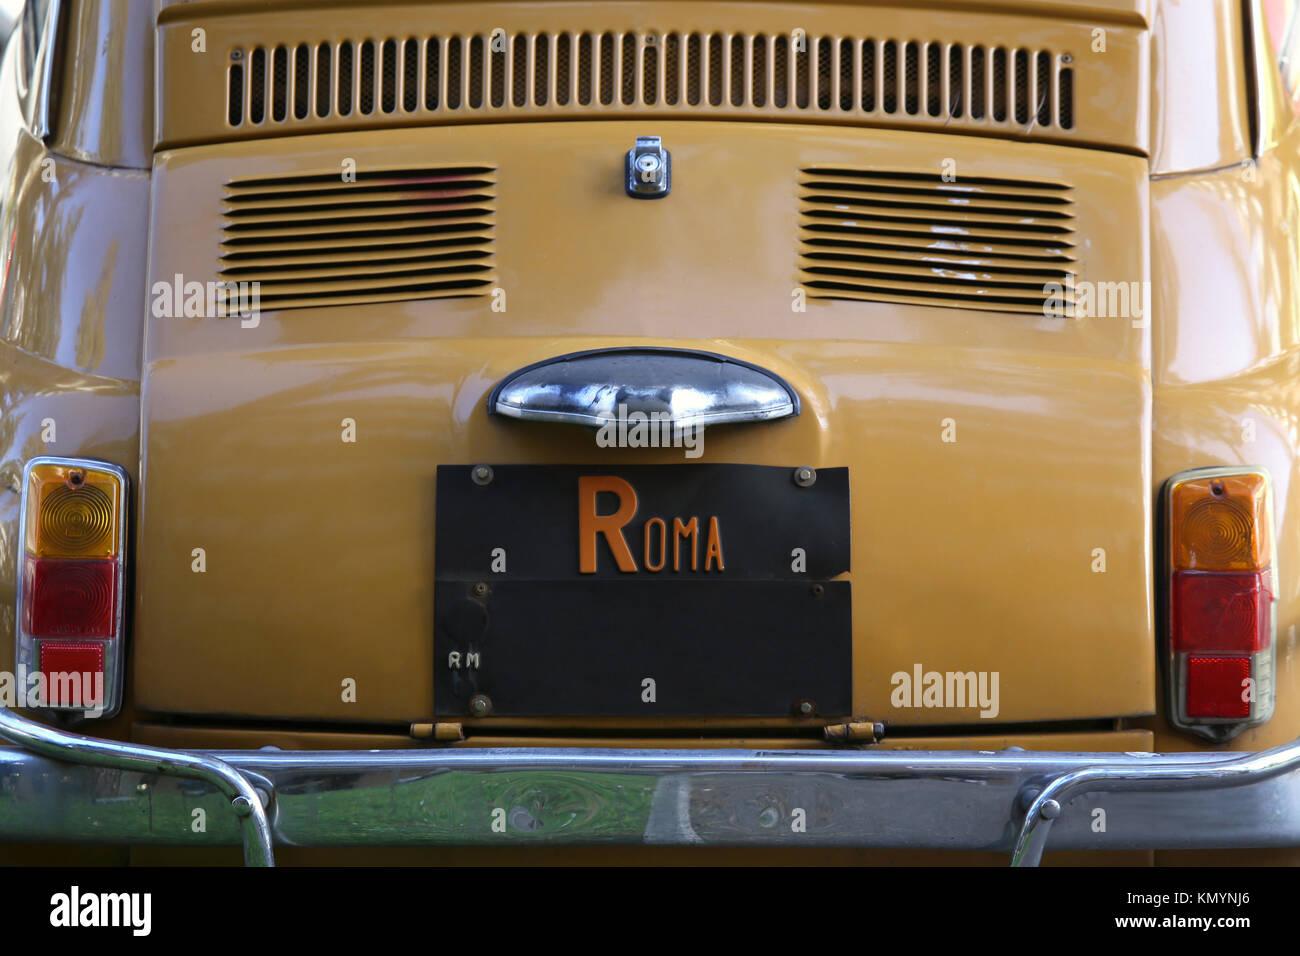 Mini Car Italy Stock Photos & Mini Car Italy Stock Images - Alamy